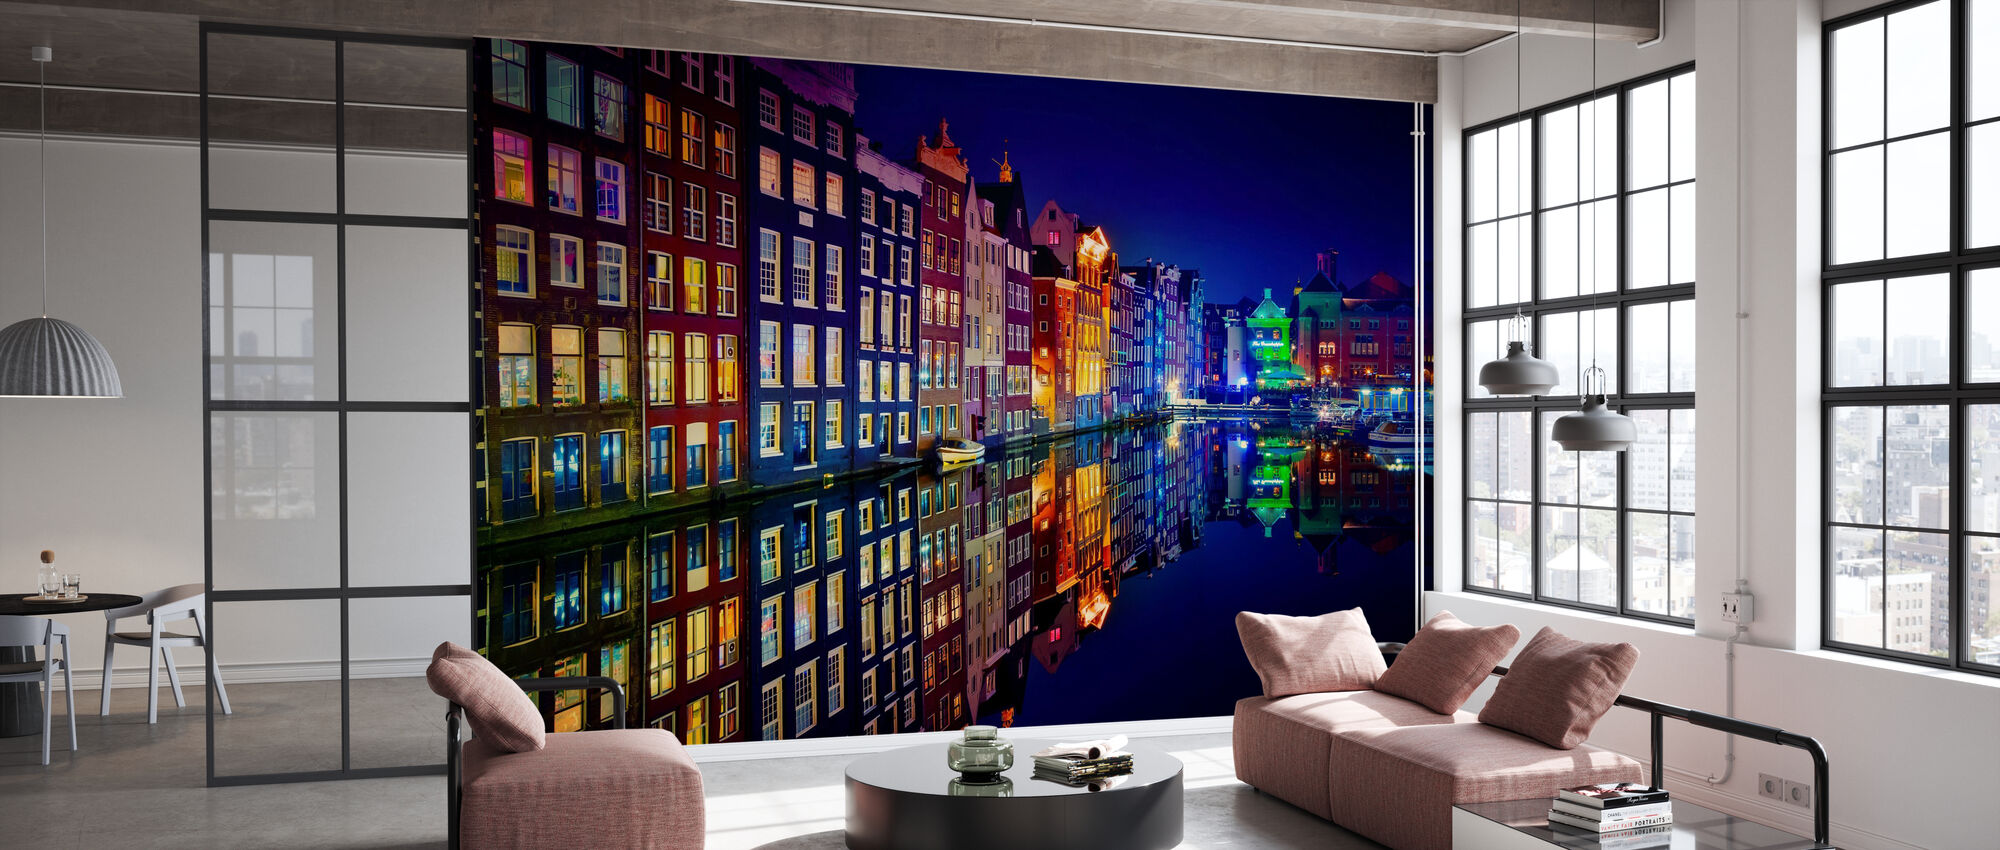 Amsterdam - Wallpaper - Office